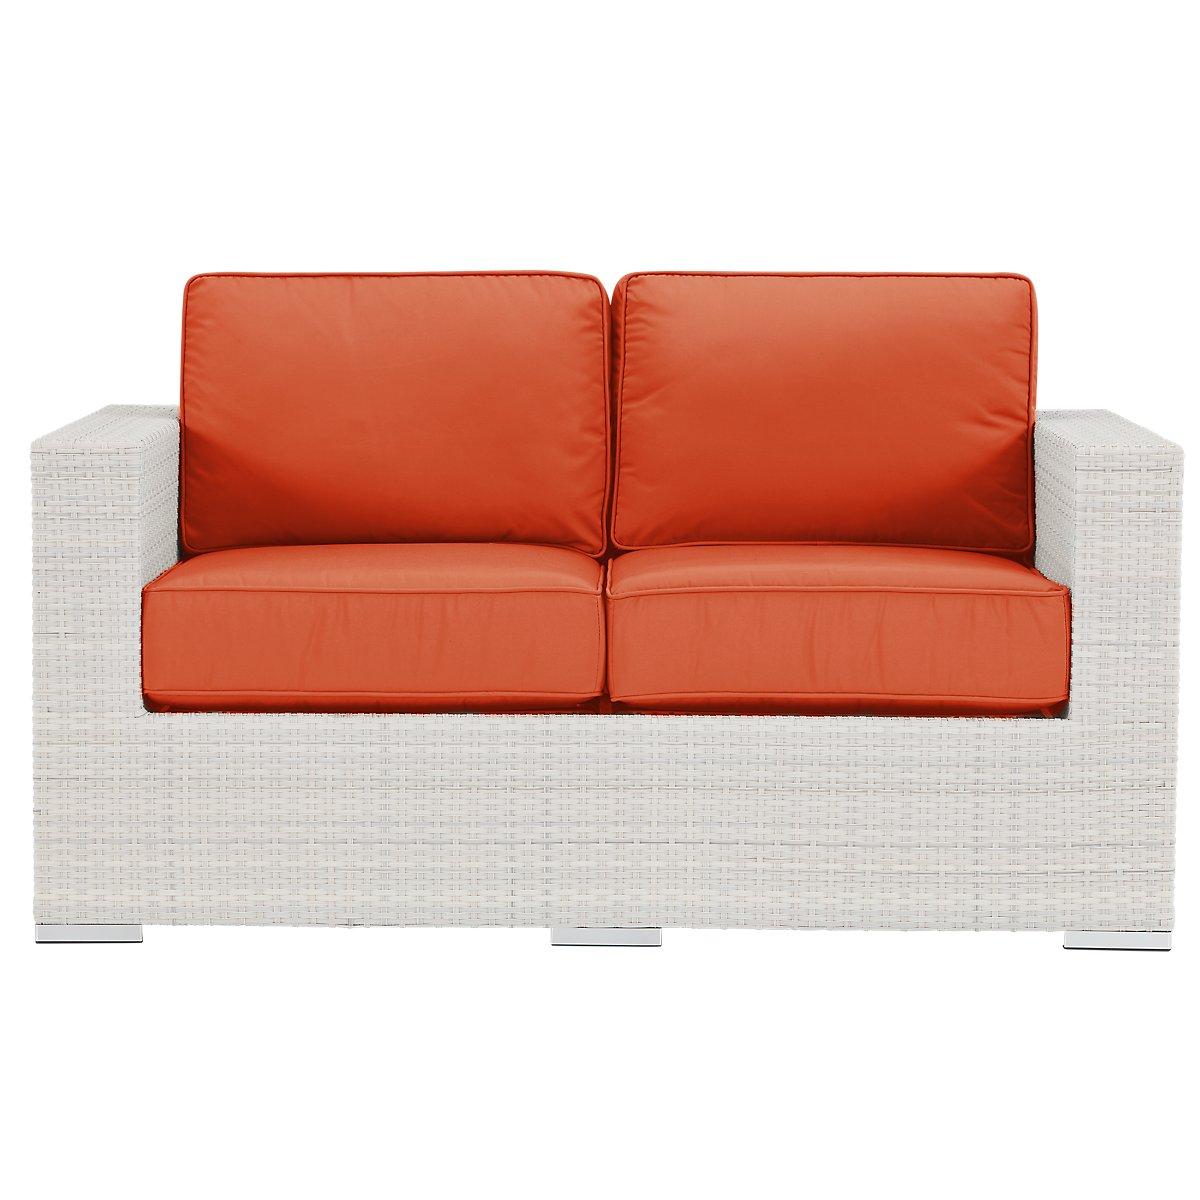 City Furniture Biscayne Orange Loveseat